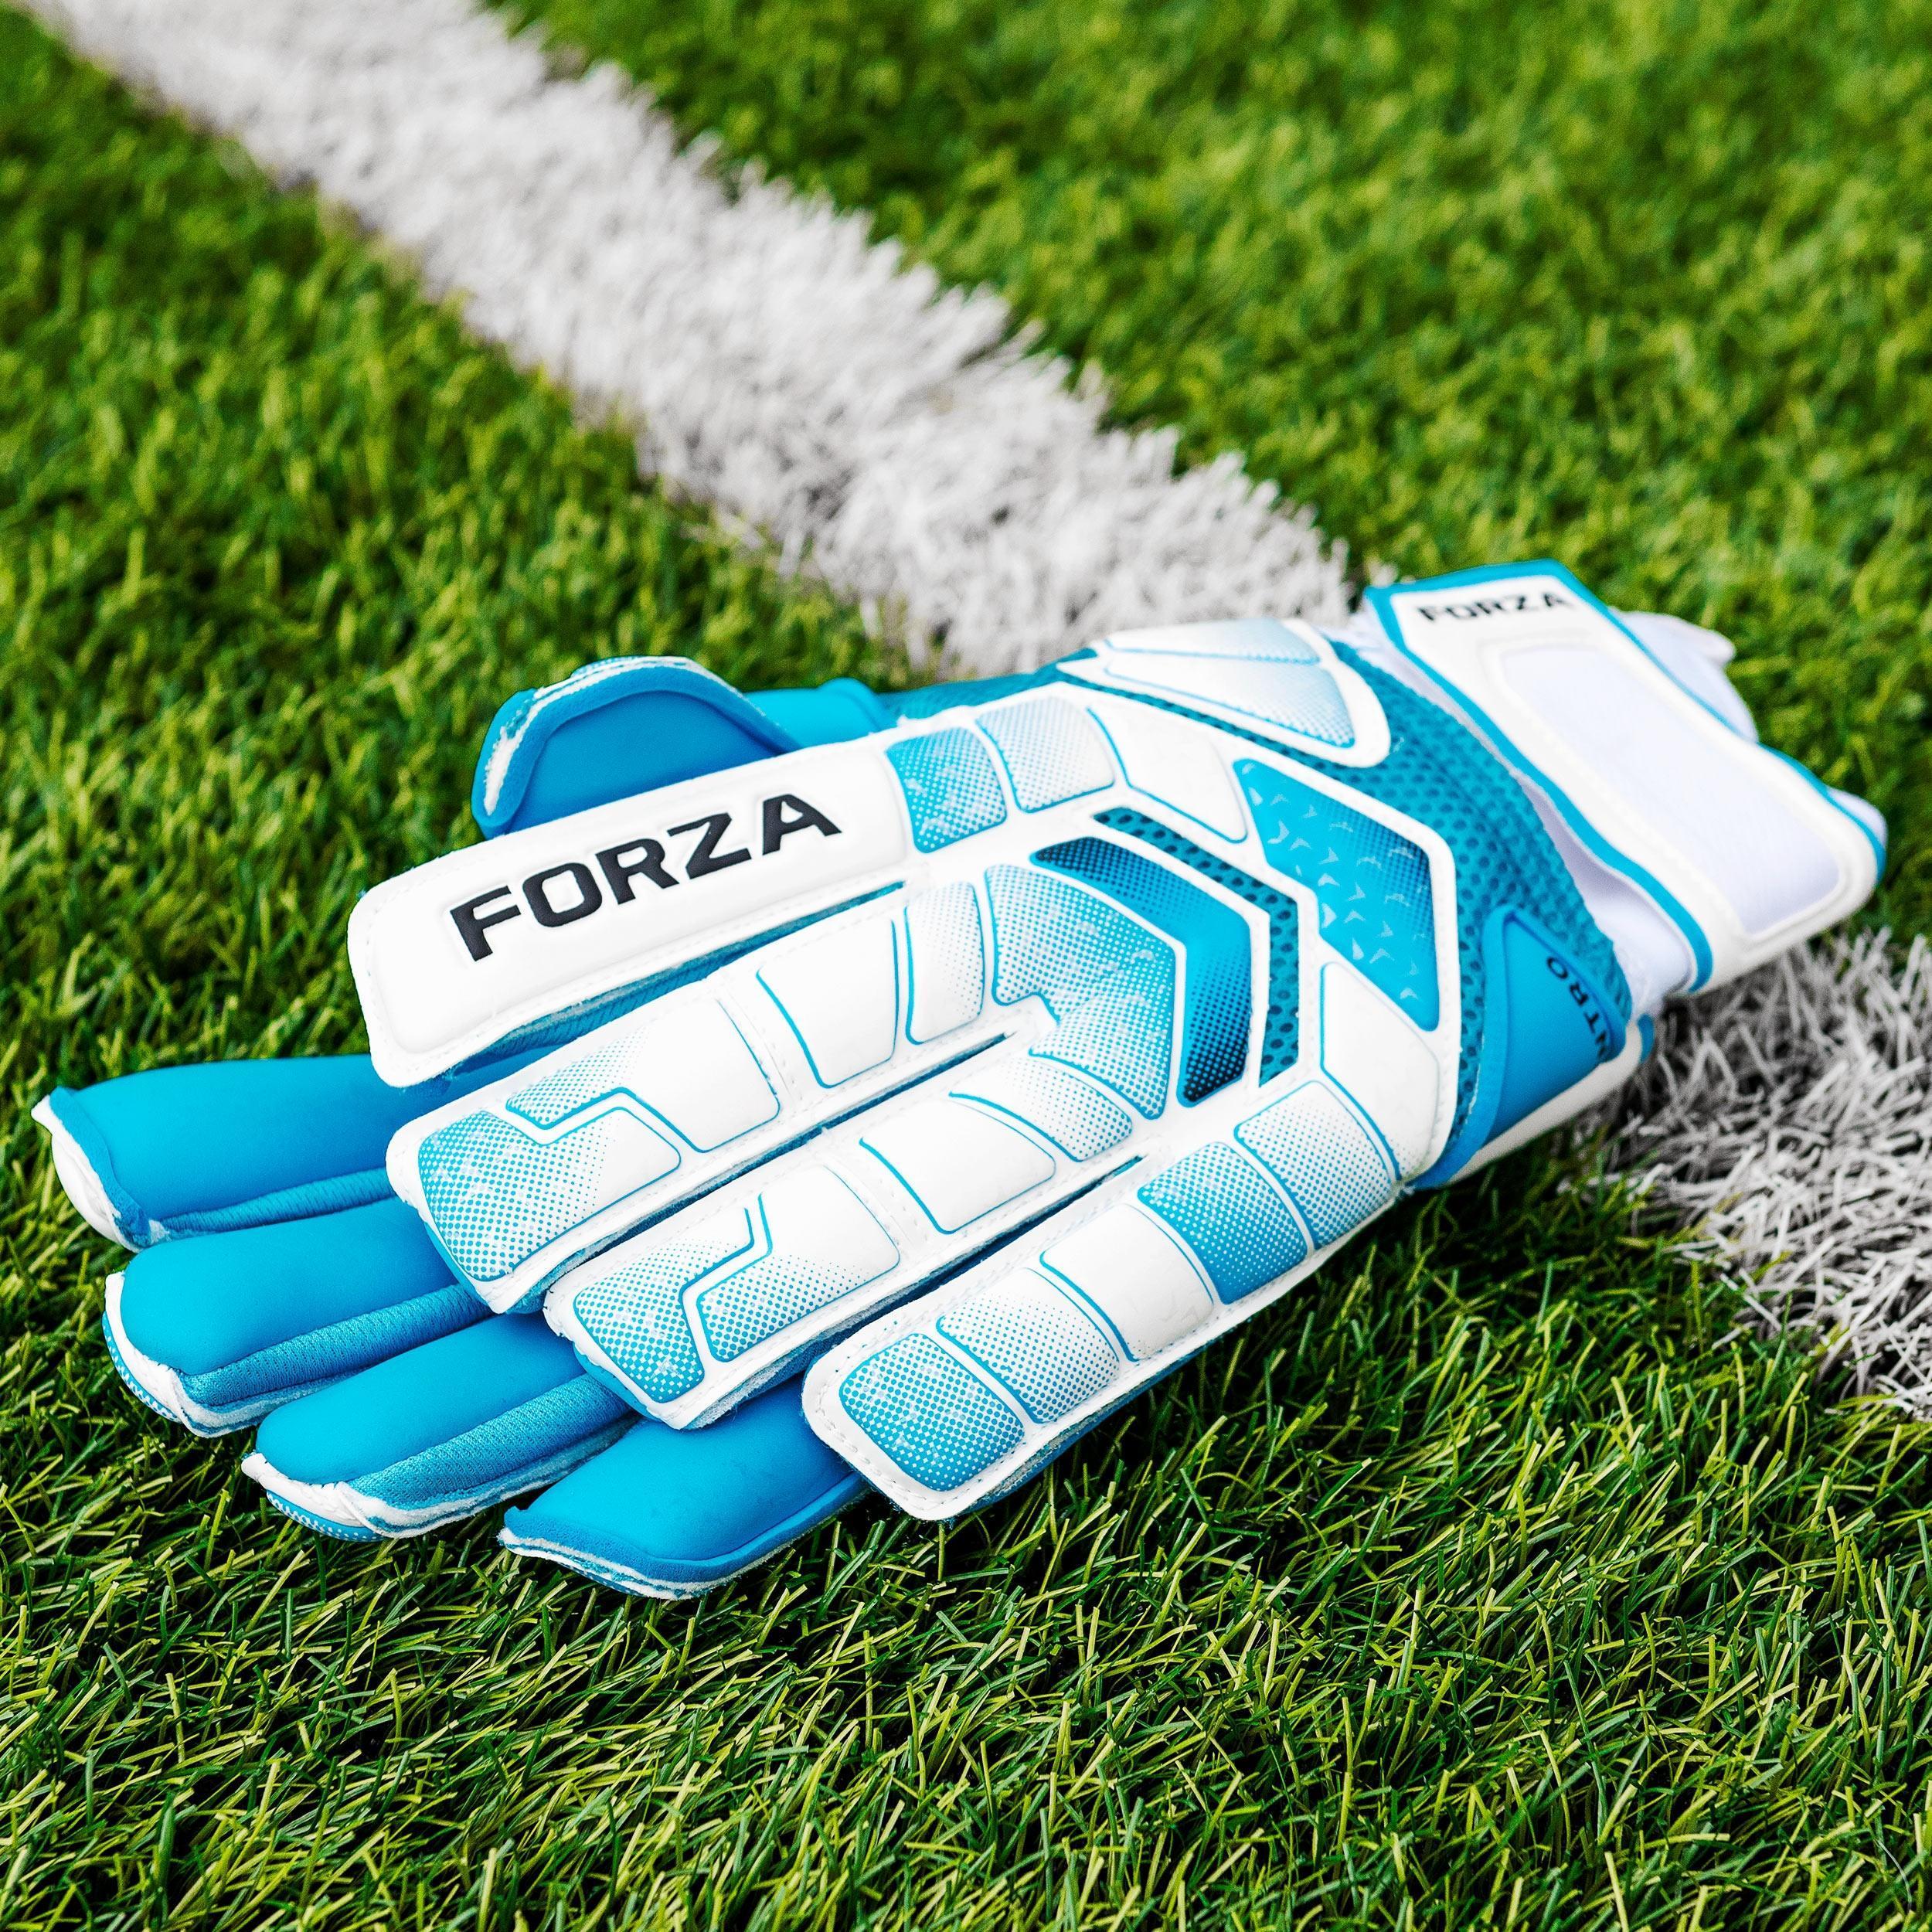 FORZA Centro Goalkeeper Gloves-Size 7